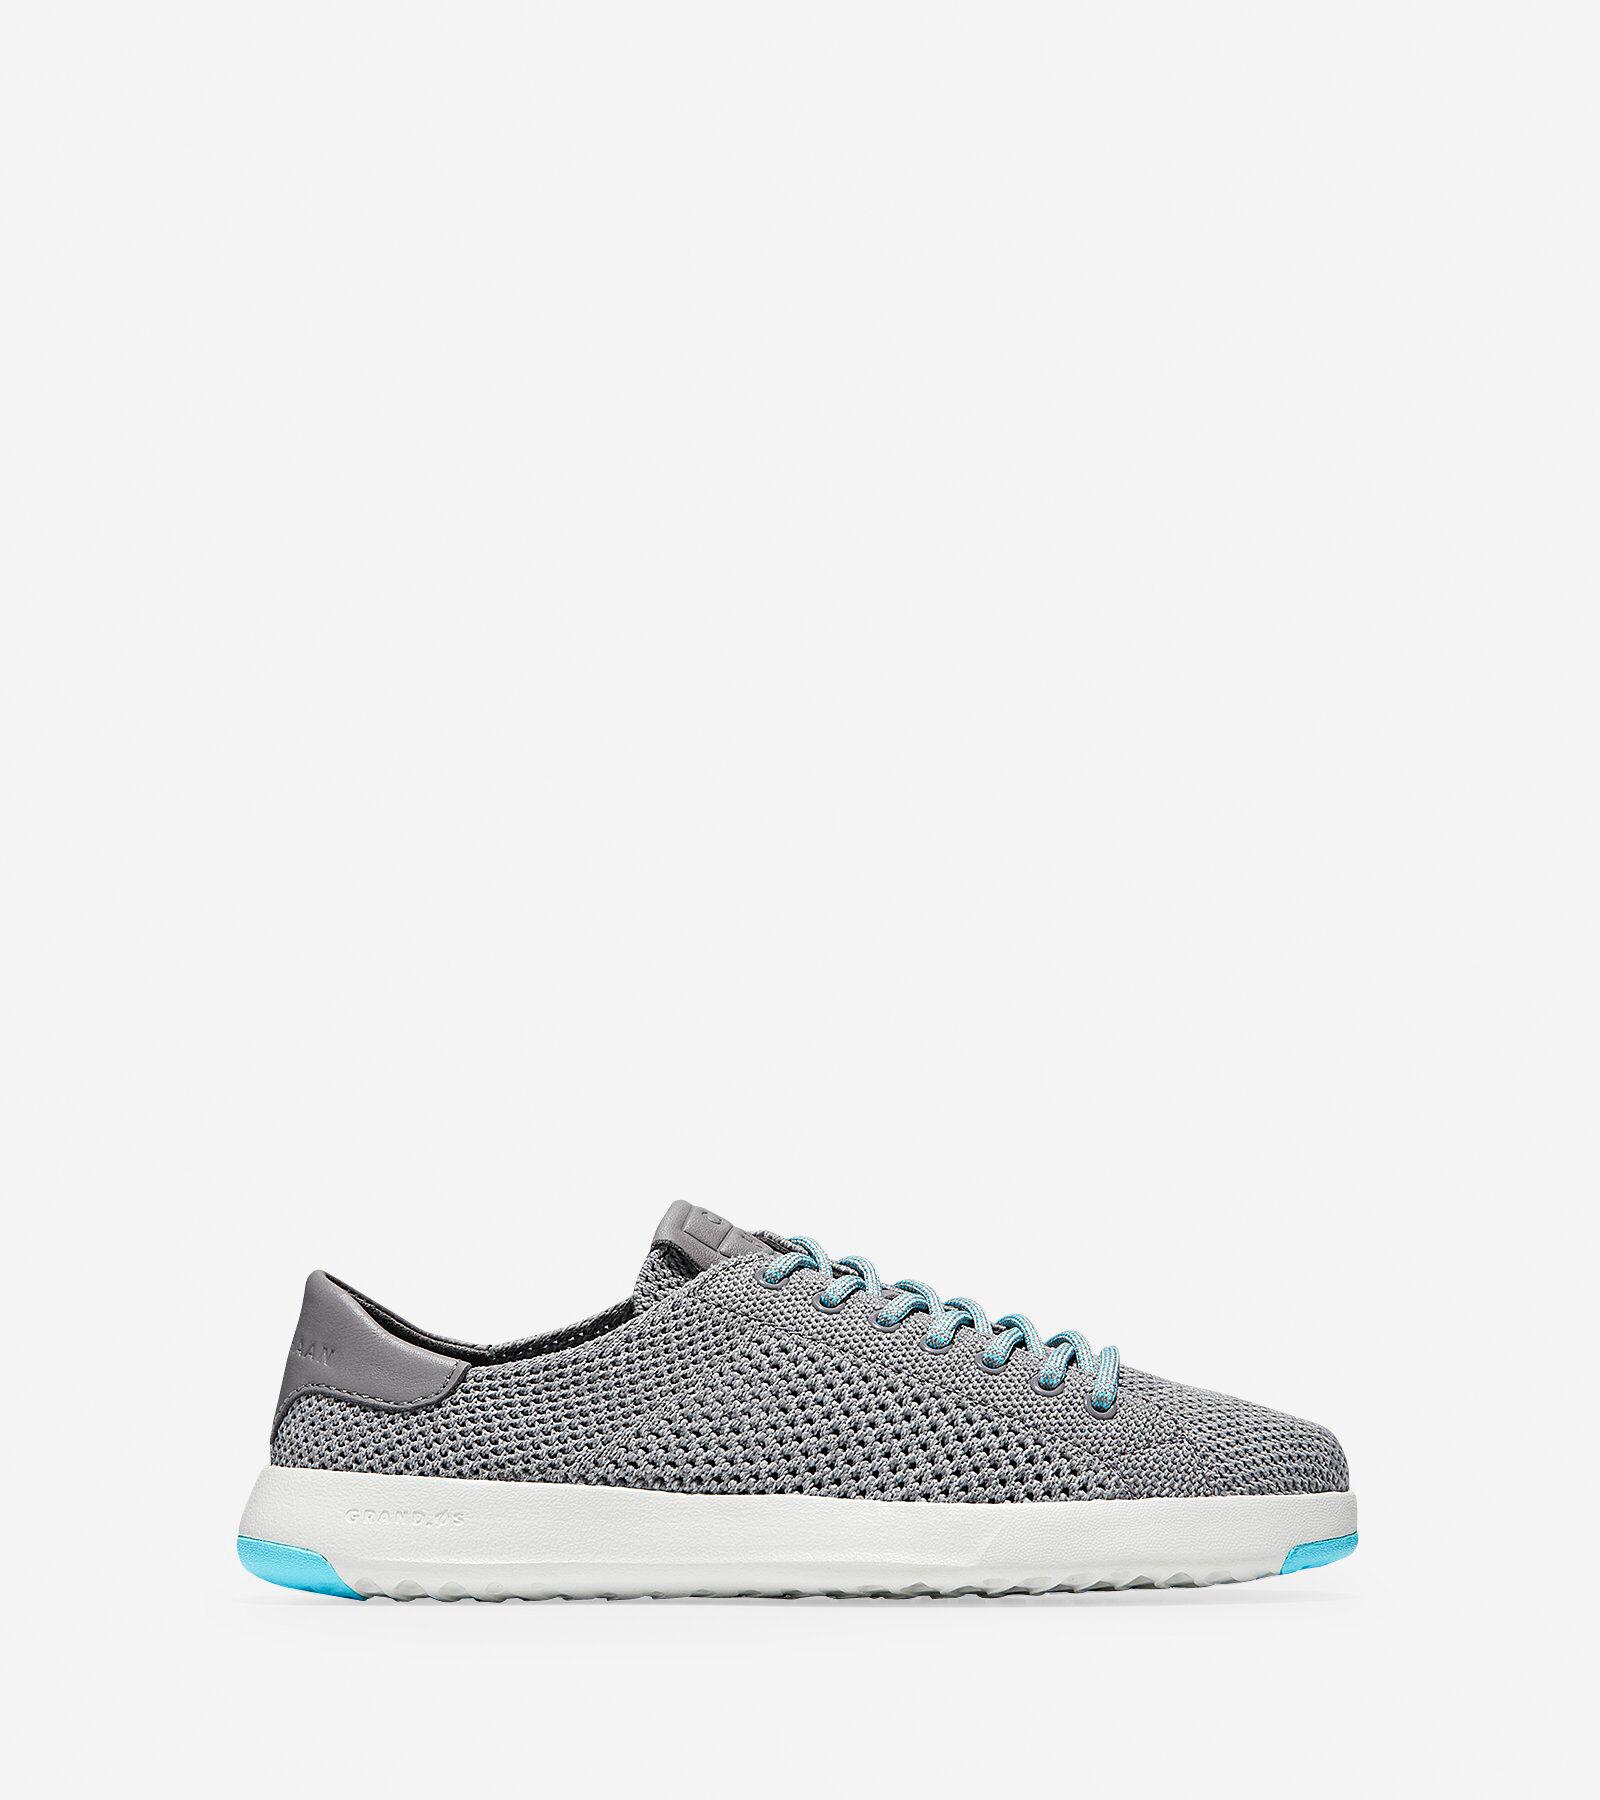 buy cheap browse FANE Footwear Grandpro Tennis Stitch Lite - Women's discount sneakernews free shipping Cheapest ICFKC